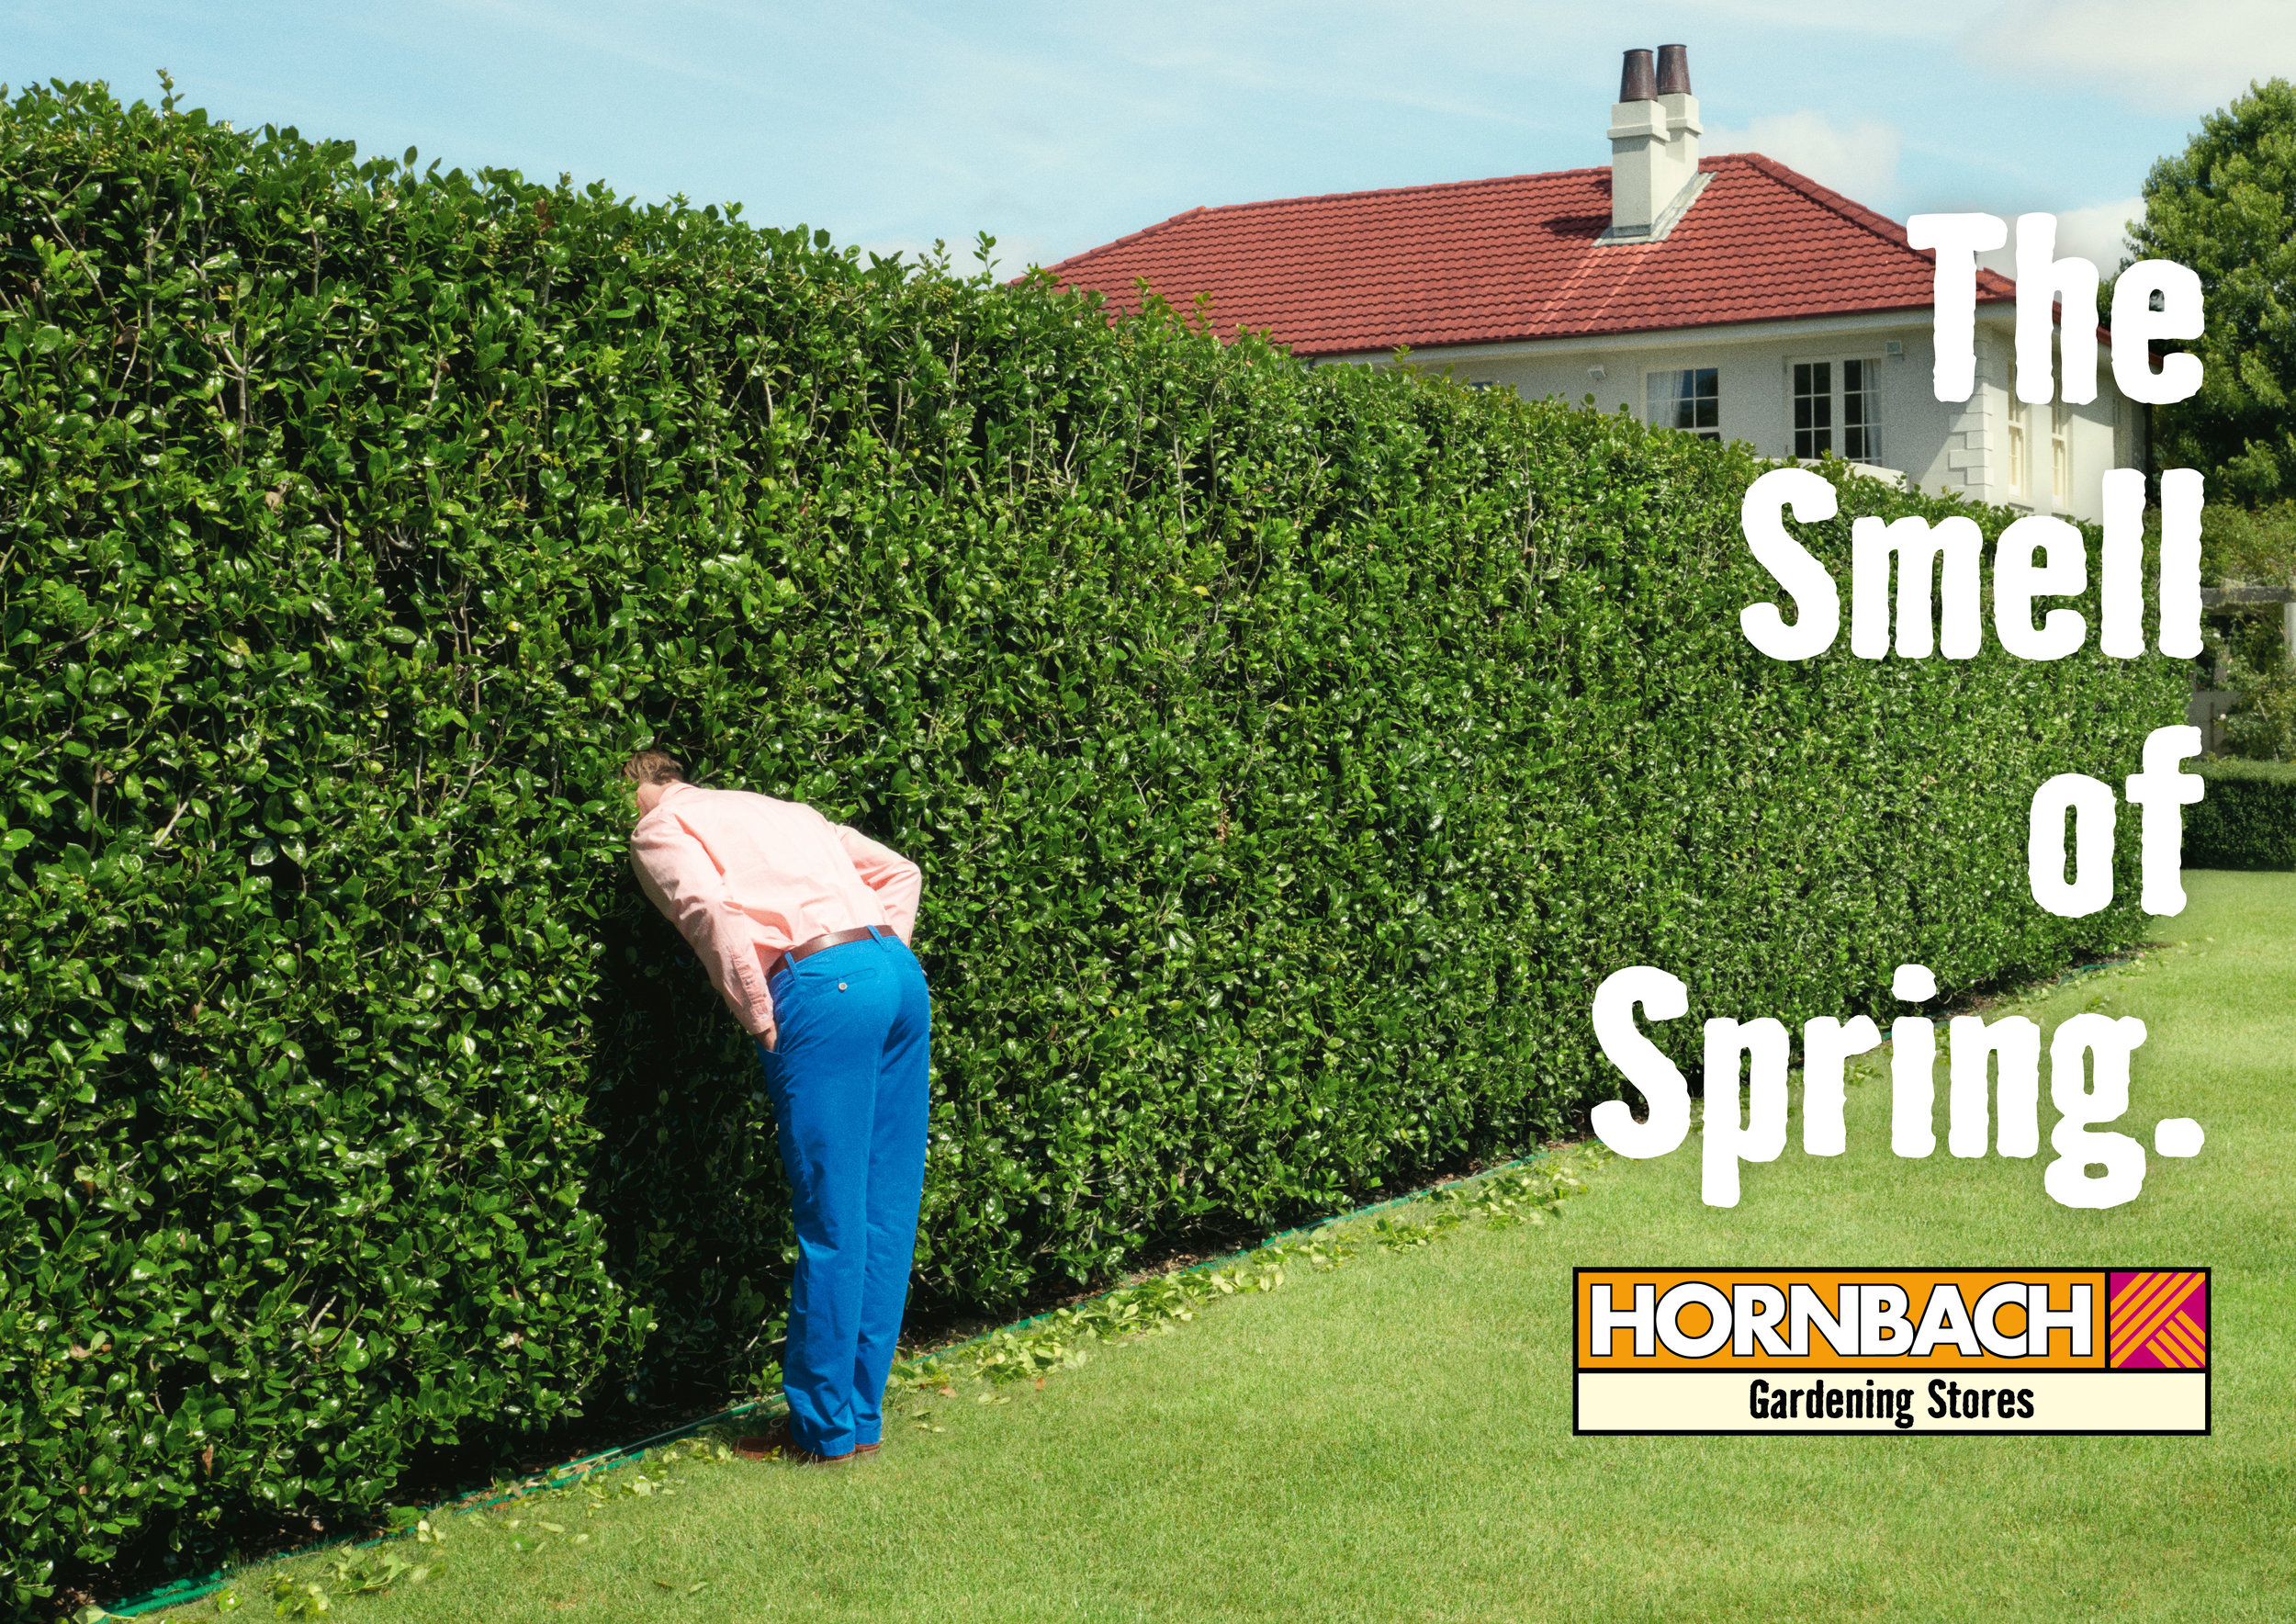 HORNBACH_Smell_of_Spring_Hedge_RGB.jpg